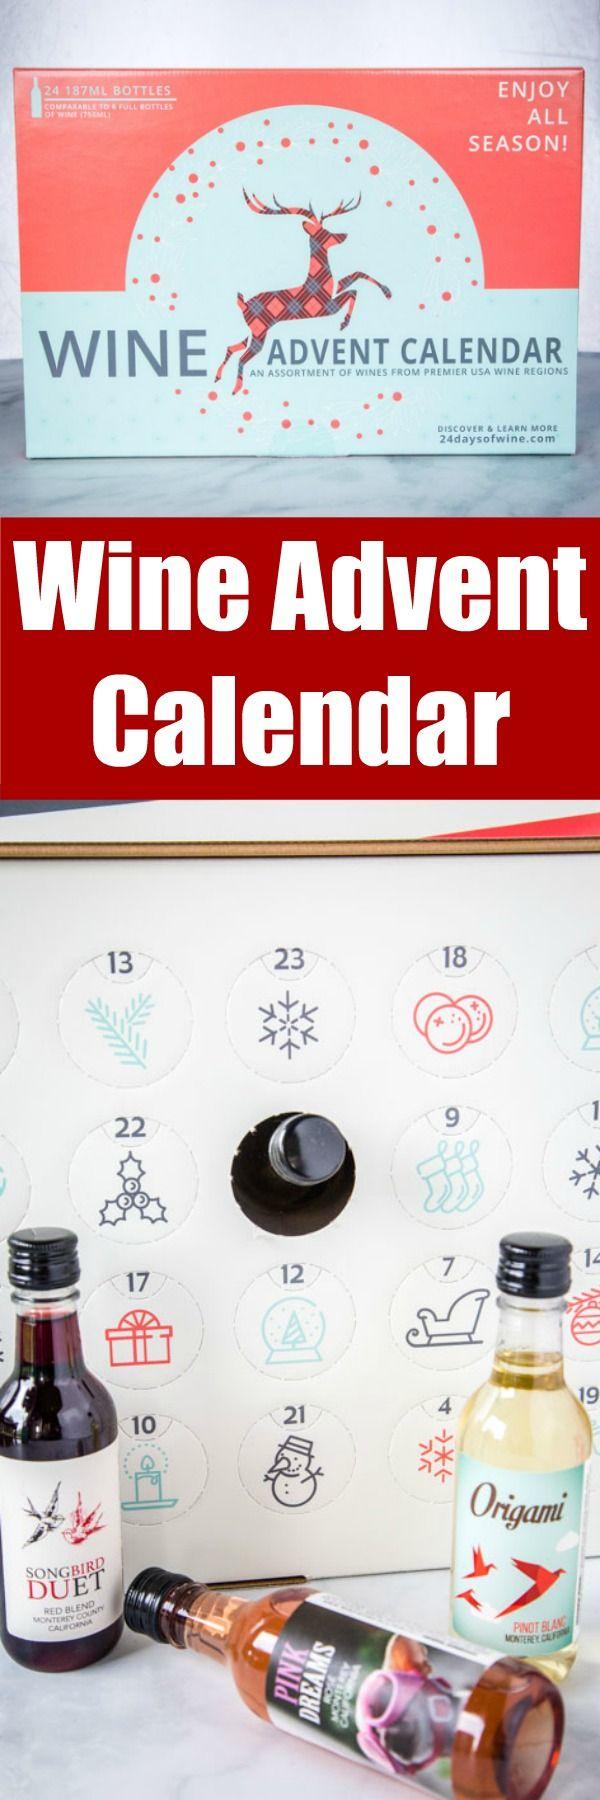 Wine Advent Calendar In 2020 Wine Advent Calendar Fun Drink Recipe Best Christmas Recipes